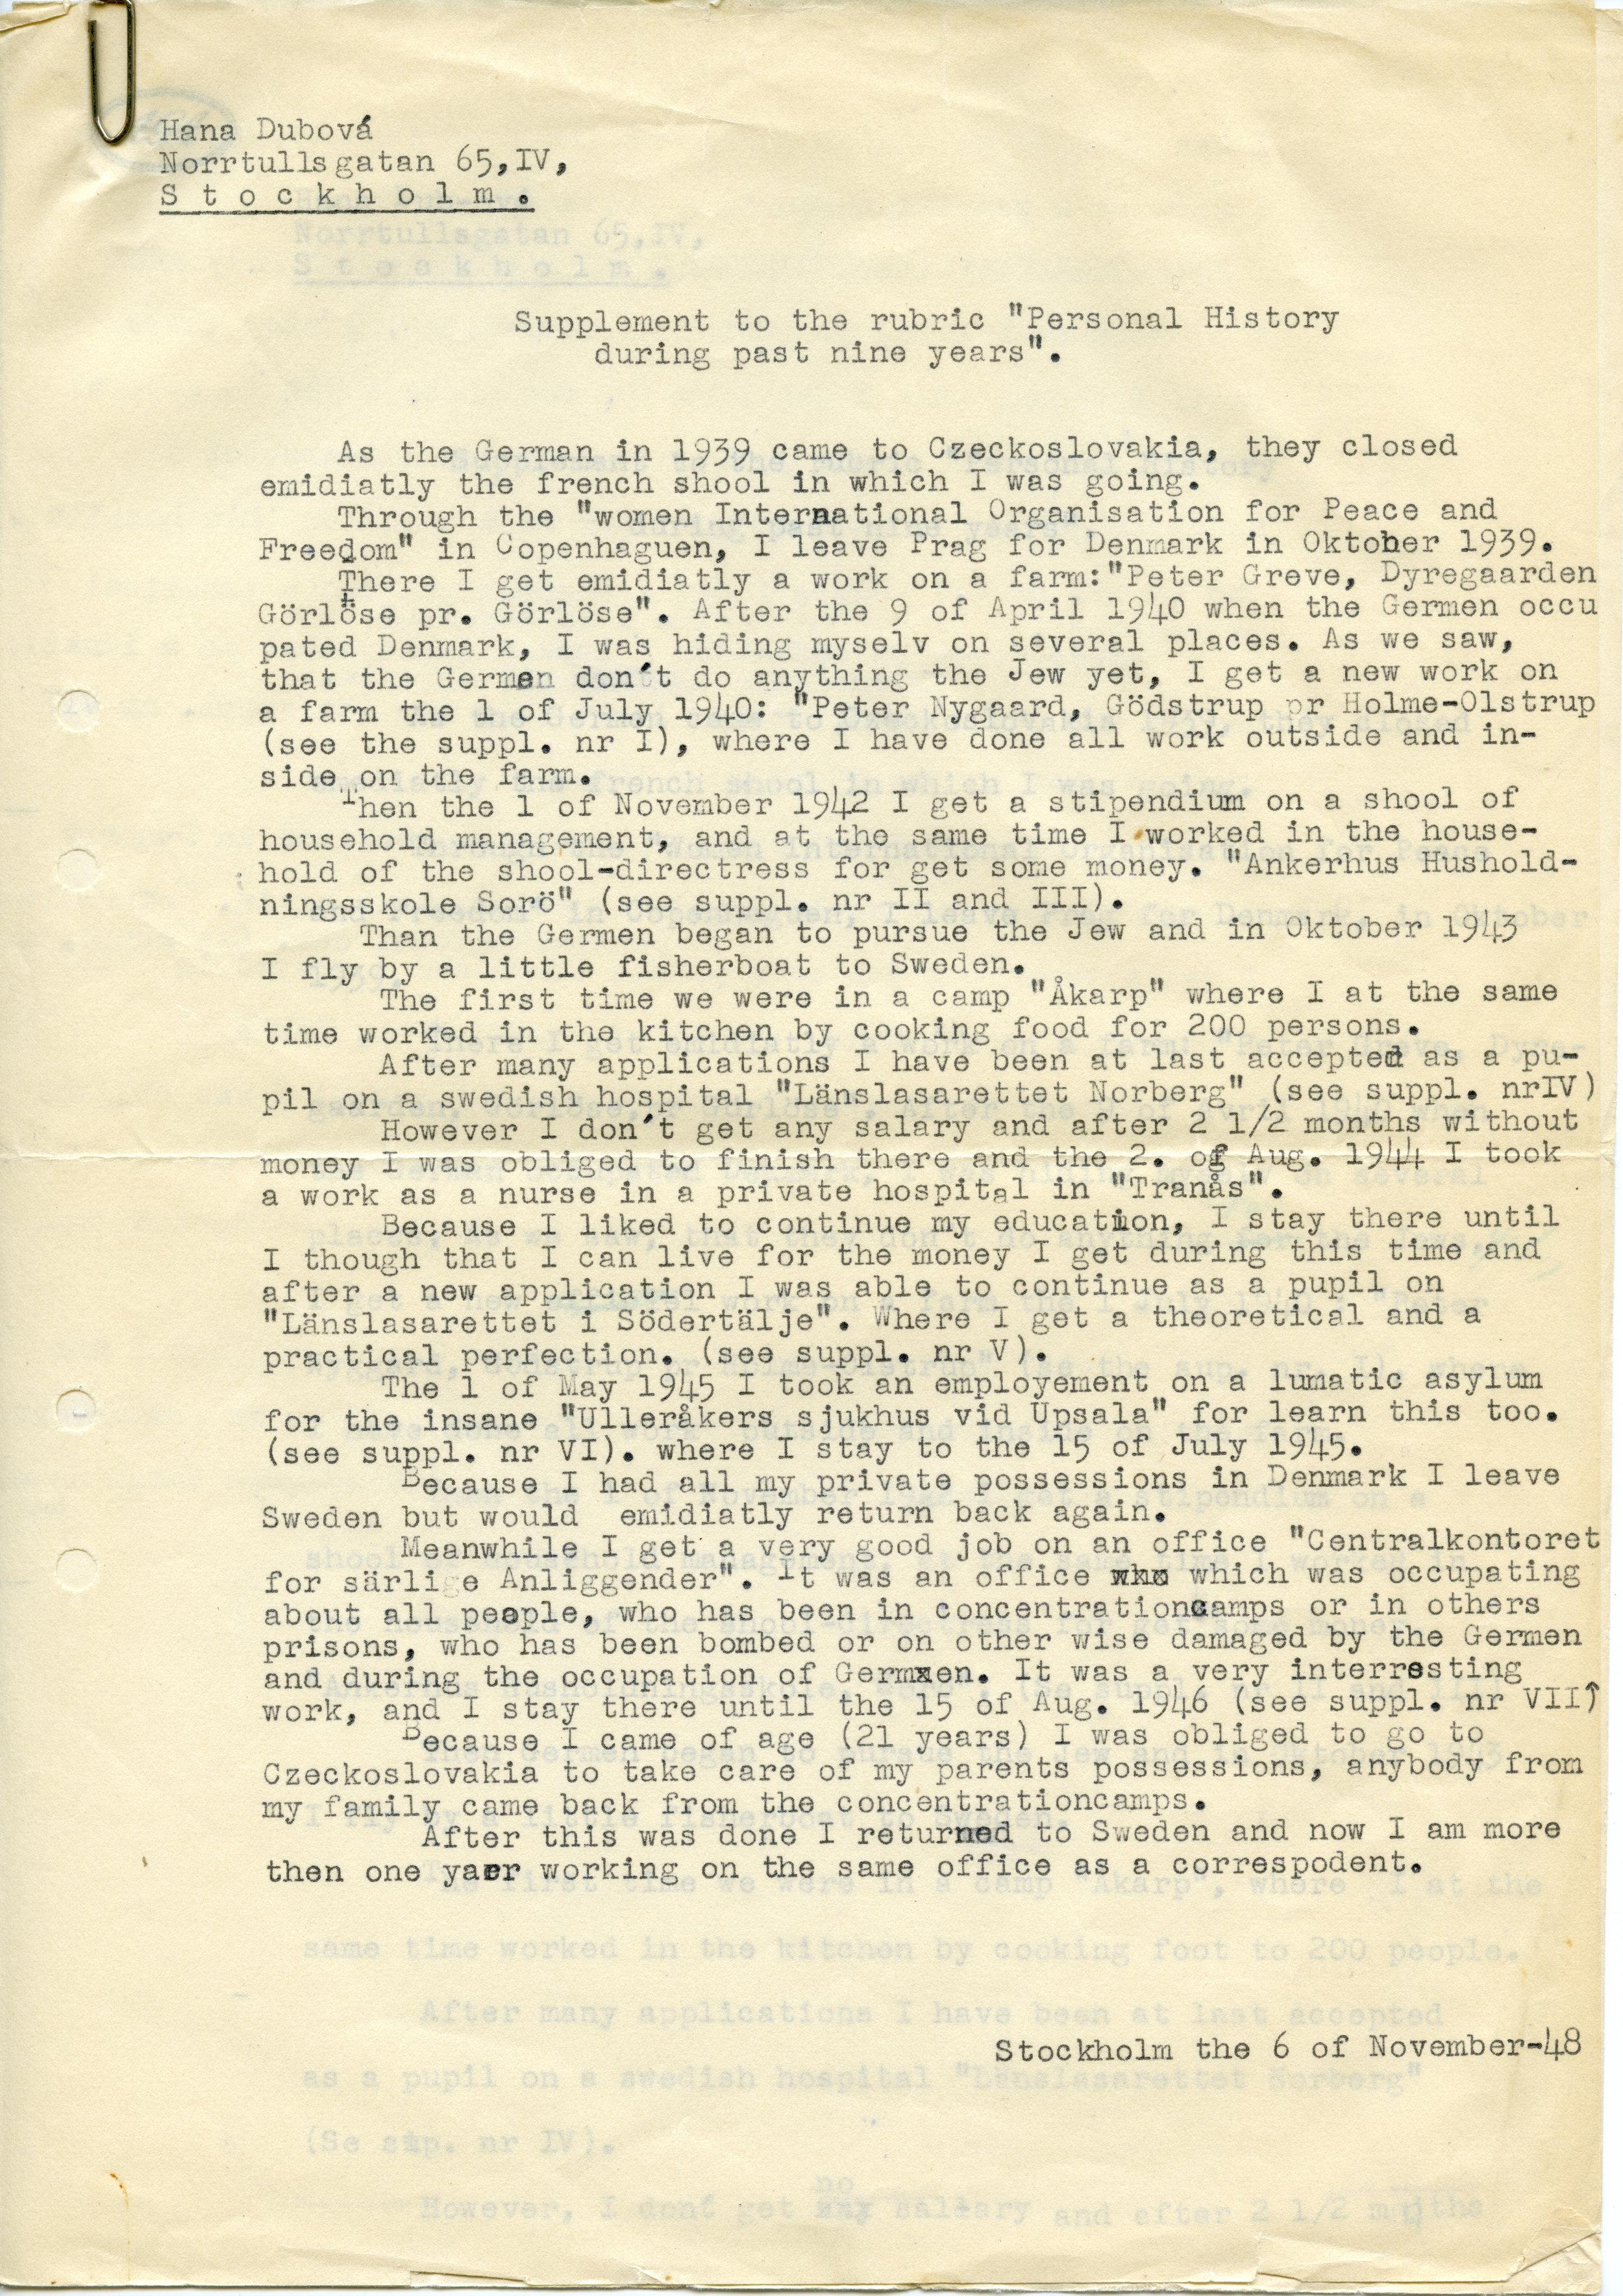 1948 supplement-001.jpg